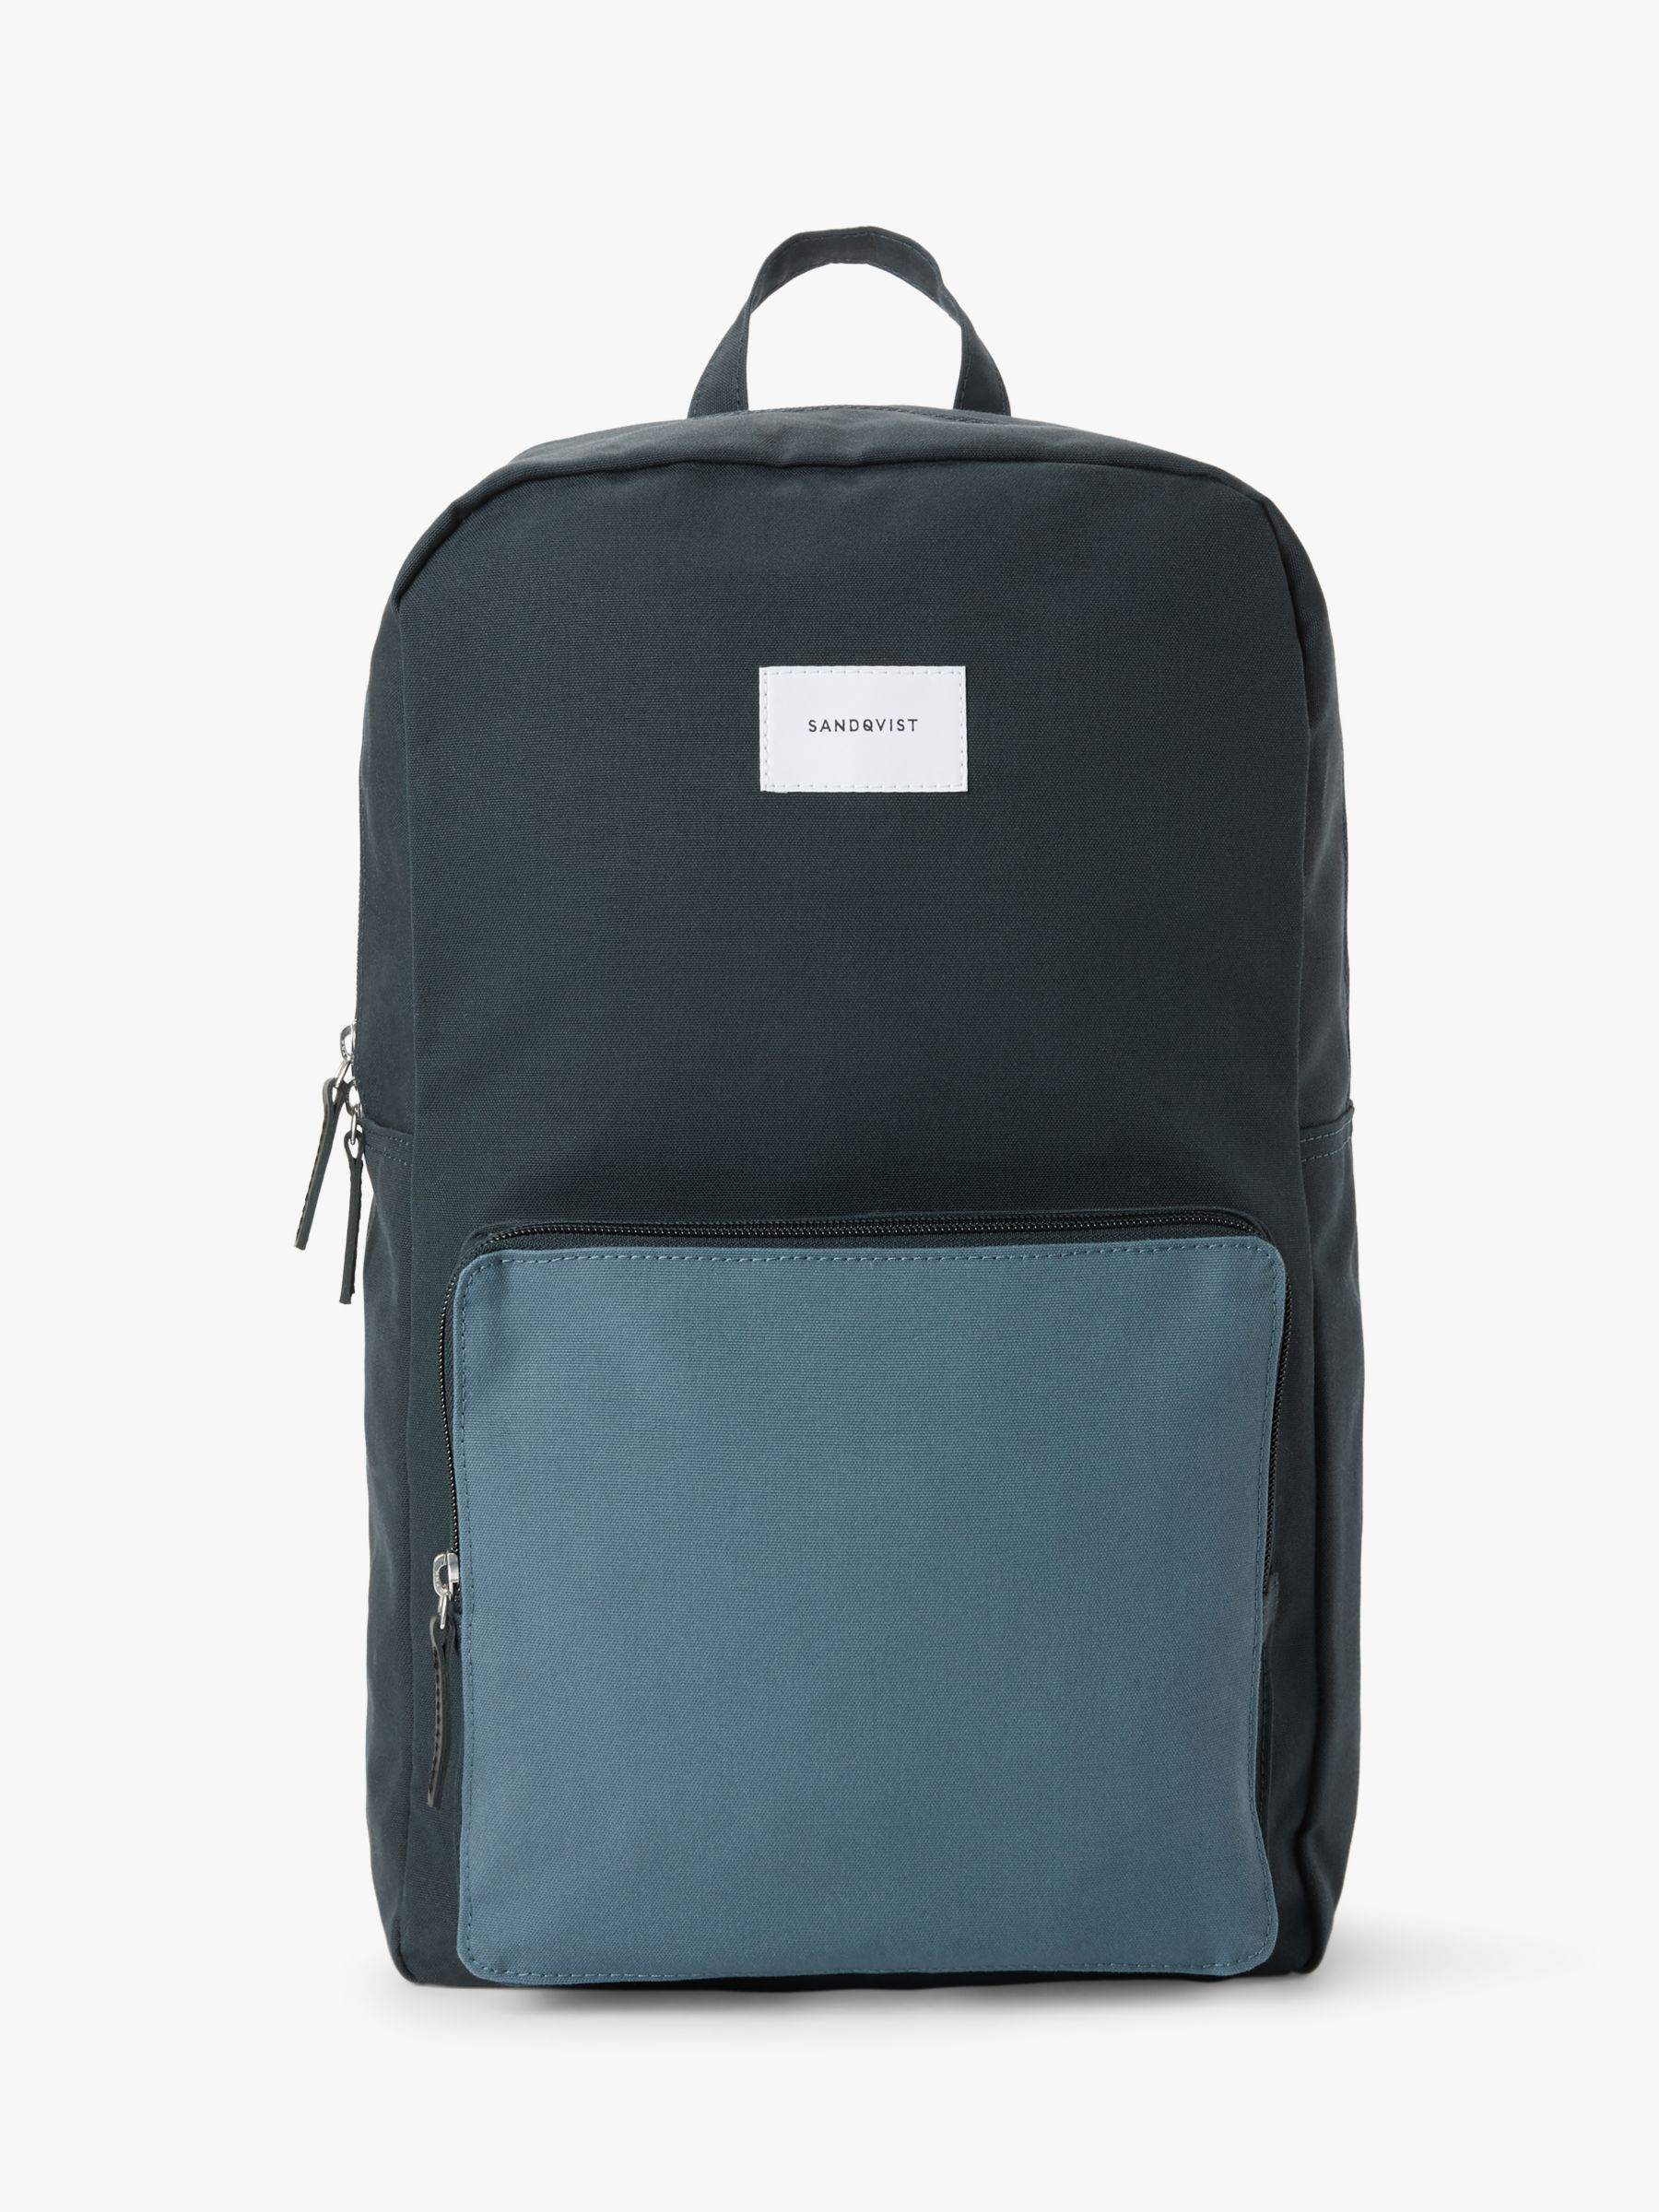 Sandqvist Sandqvist Kim Ground Organic Cotton Backpack